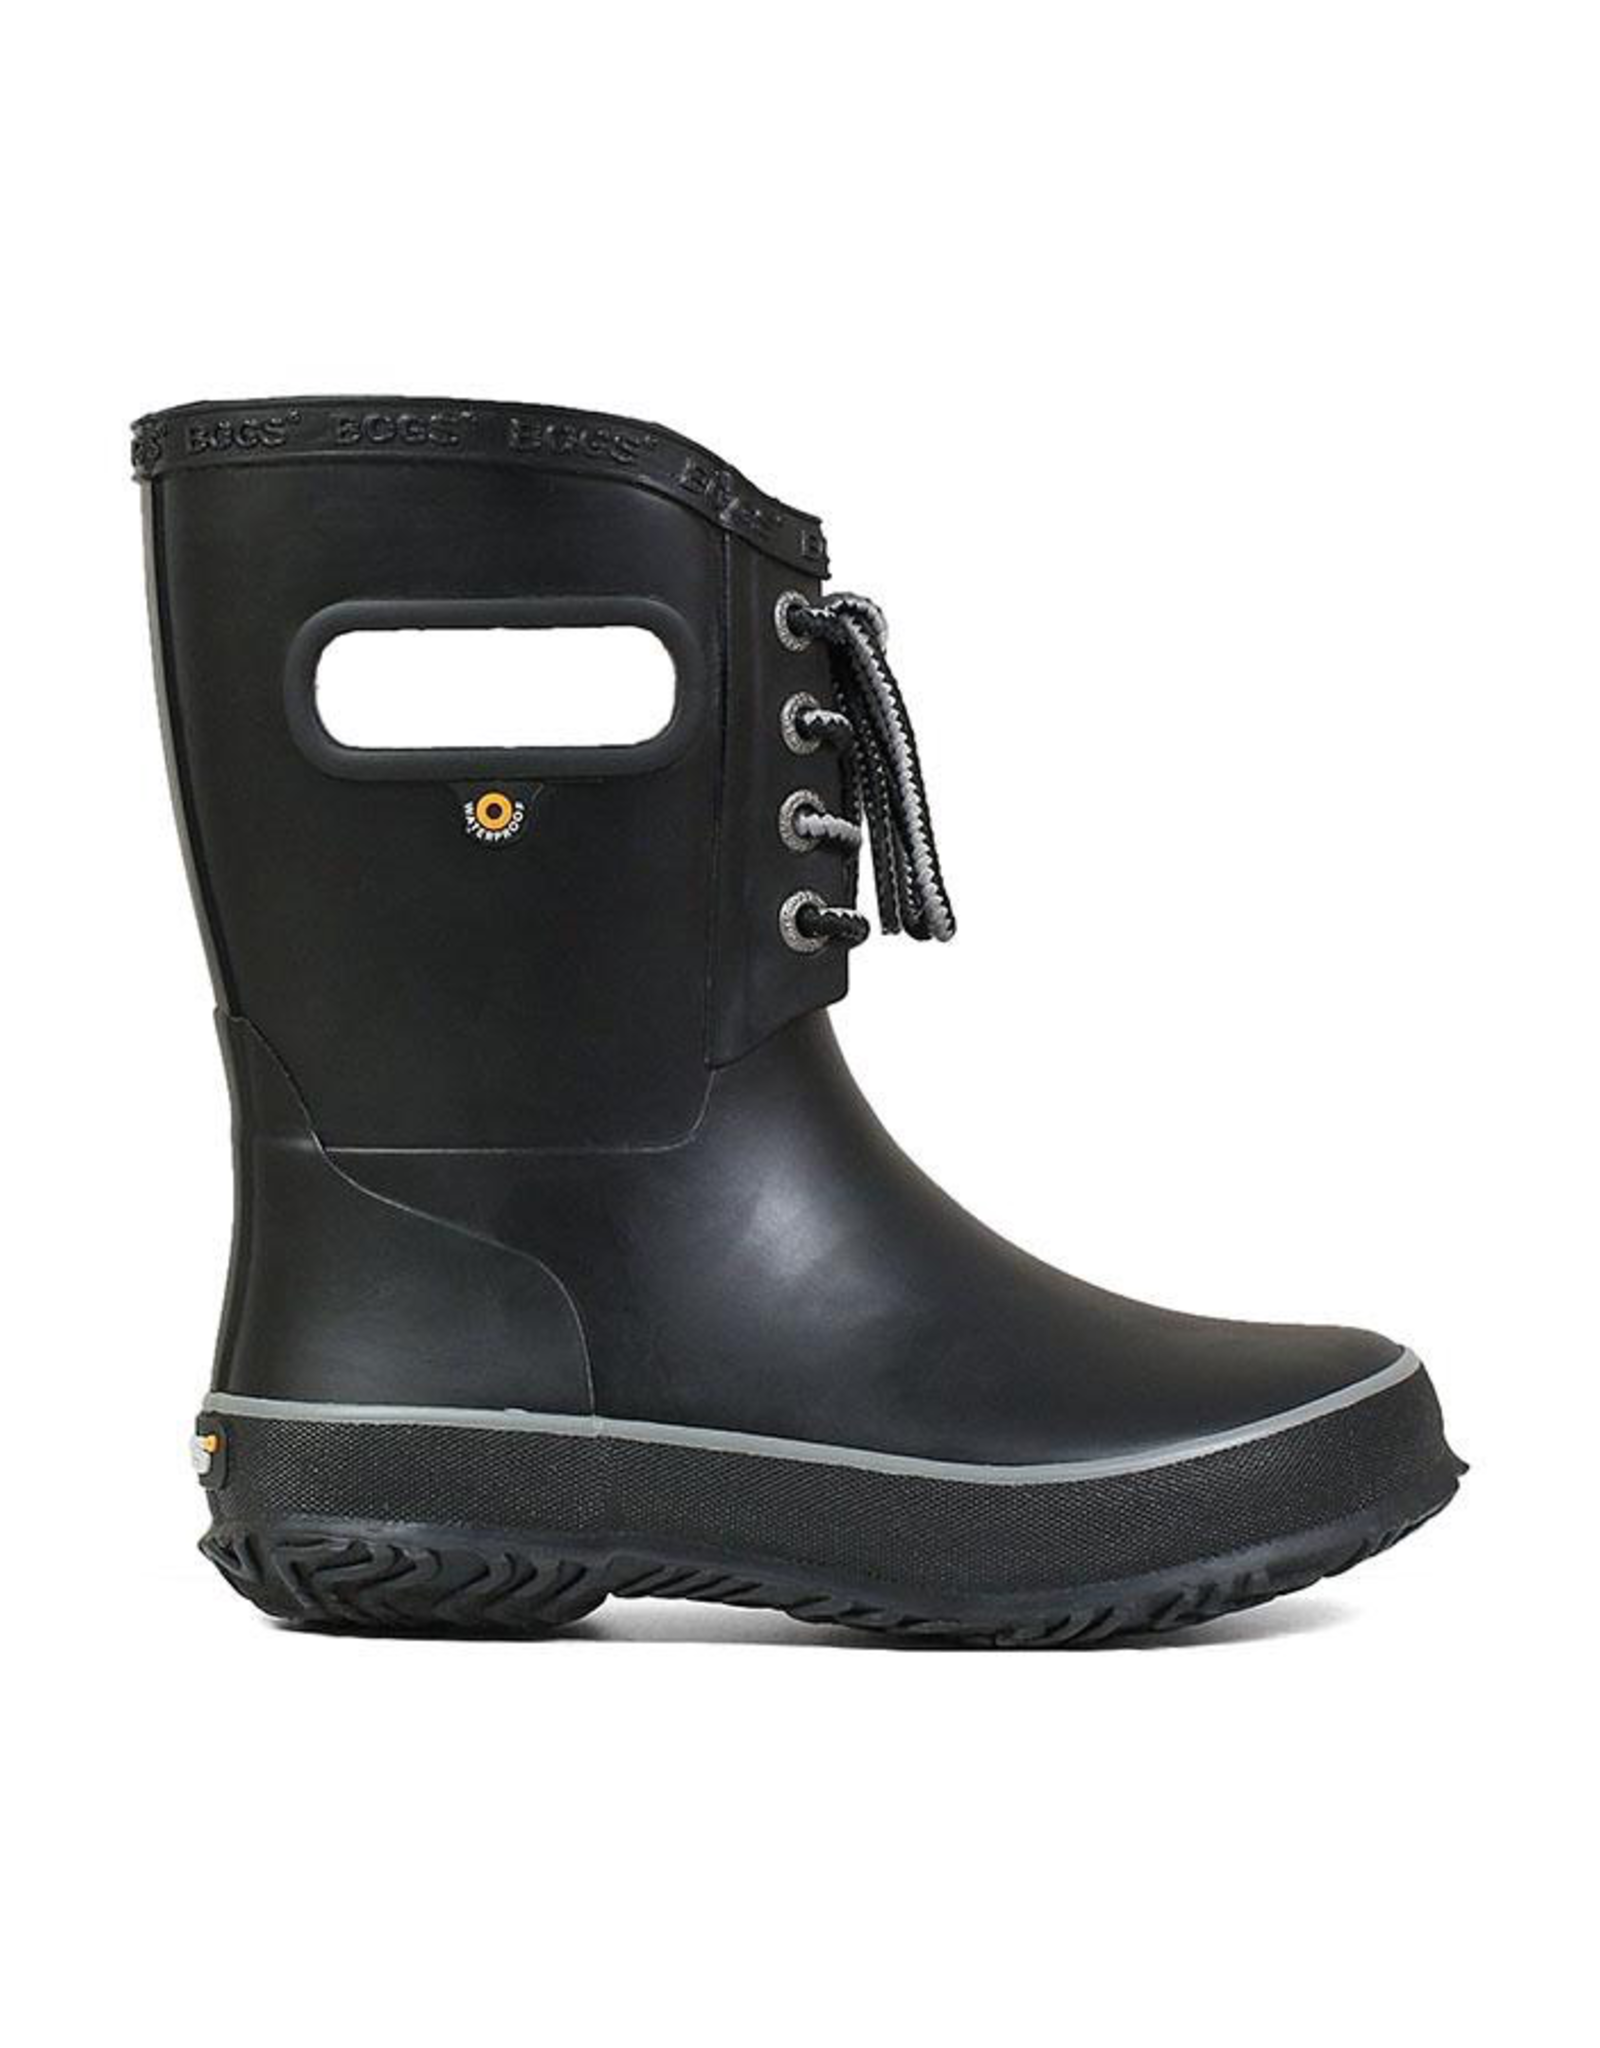 Bogs Kids' B-Amanda Plush Rain Boots